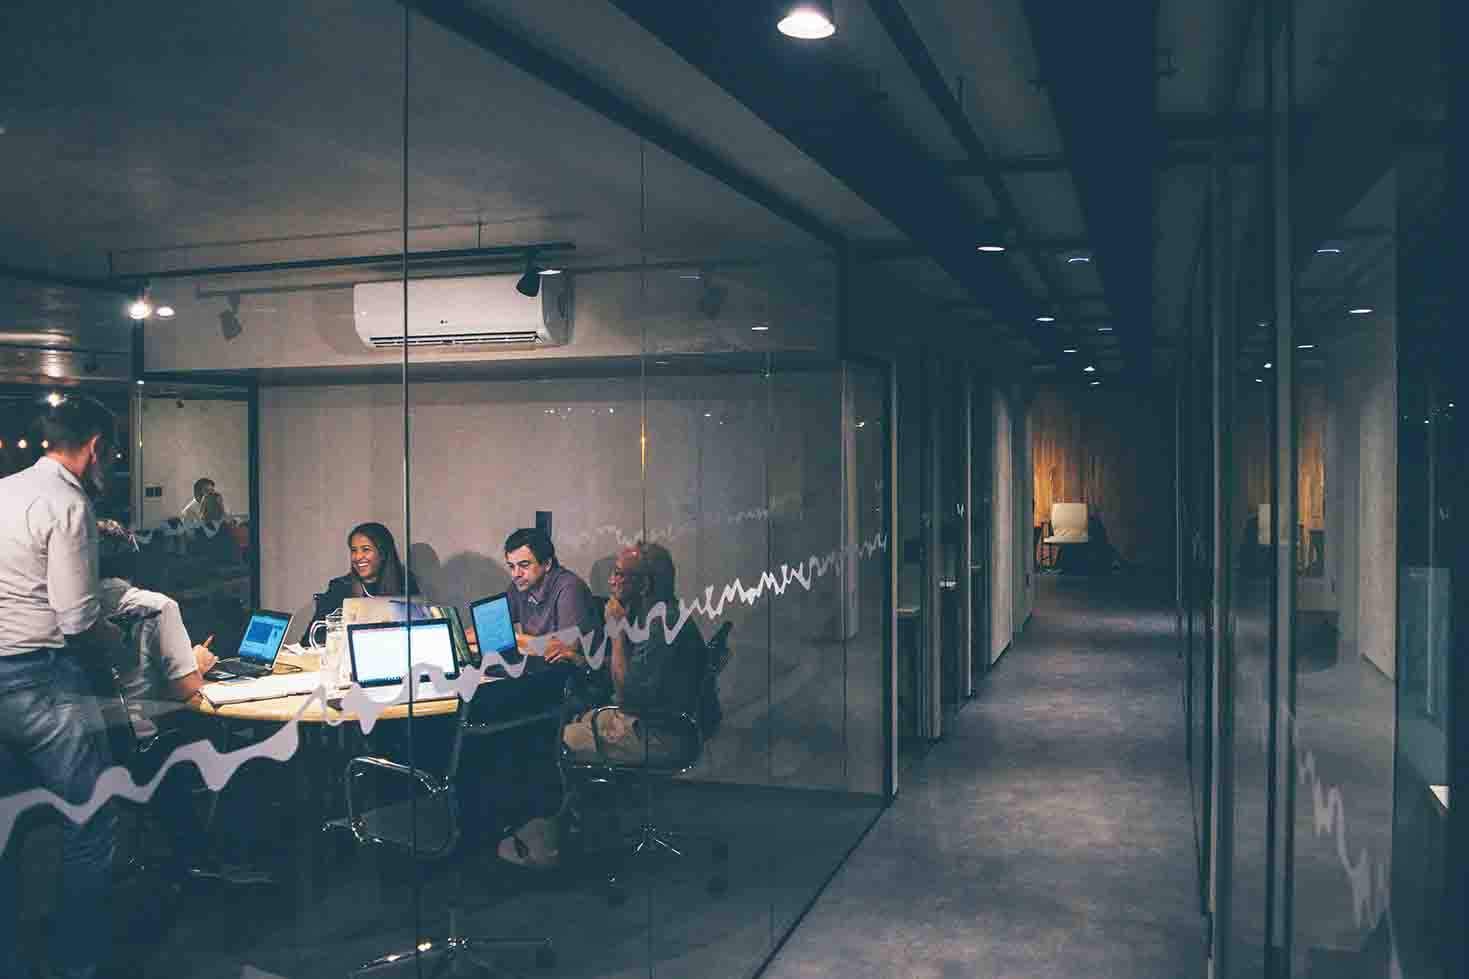 Steppingblocks Digital Career Counselor Computer Science Report